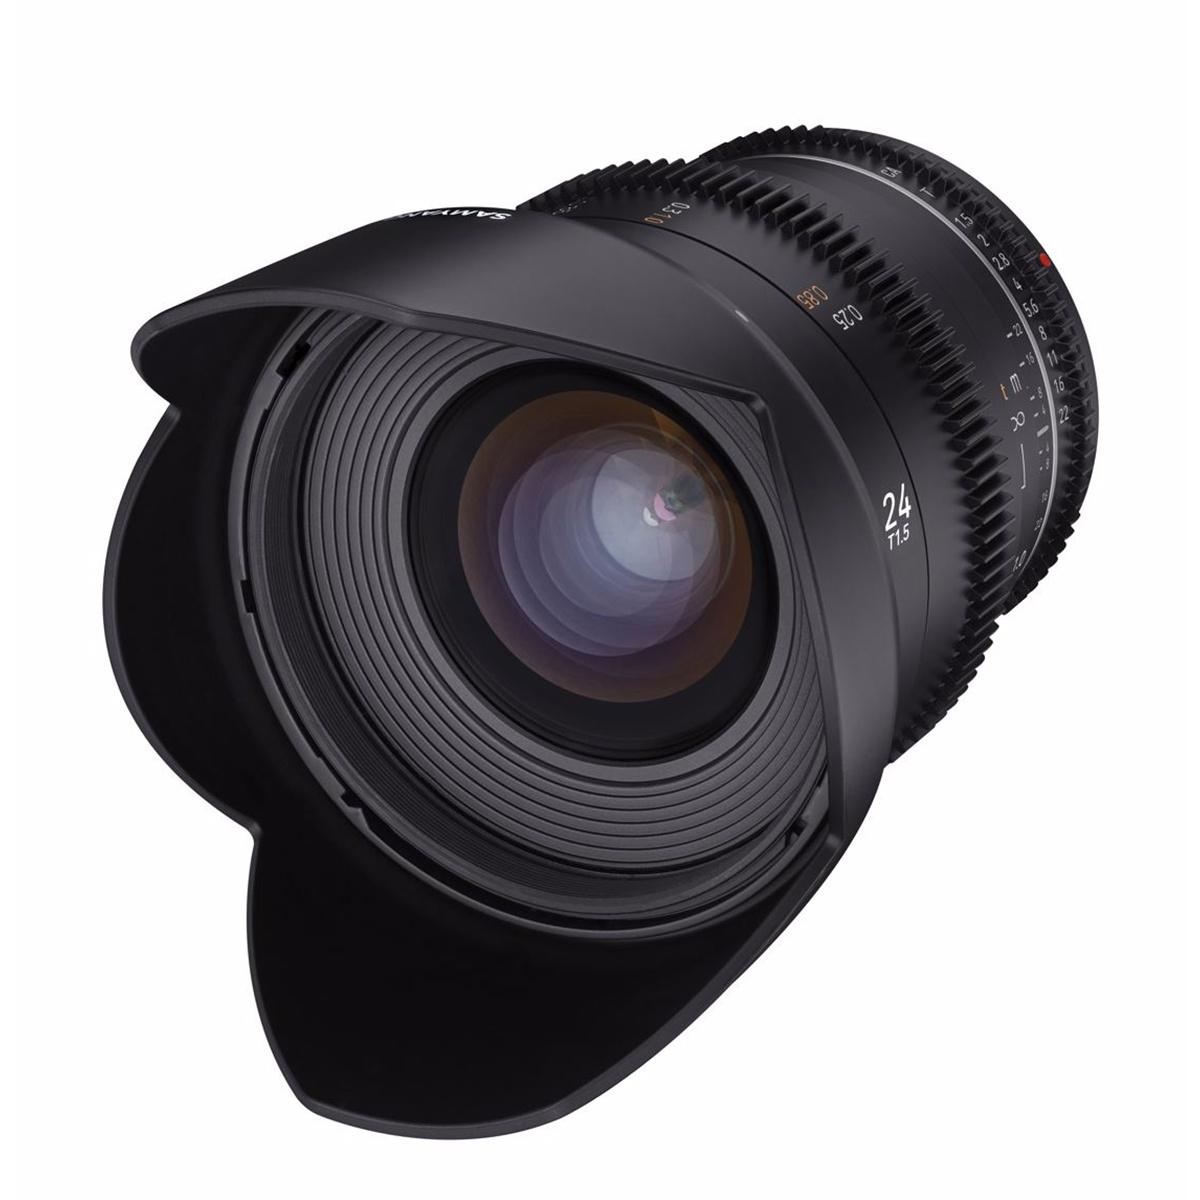 SAMYANG 24mm T1.5 VDSLR MK2 Canon EF